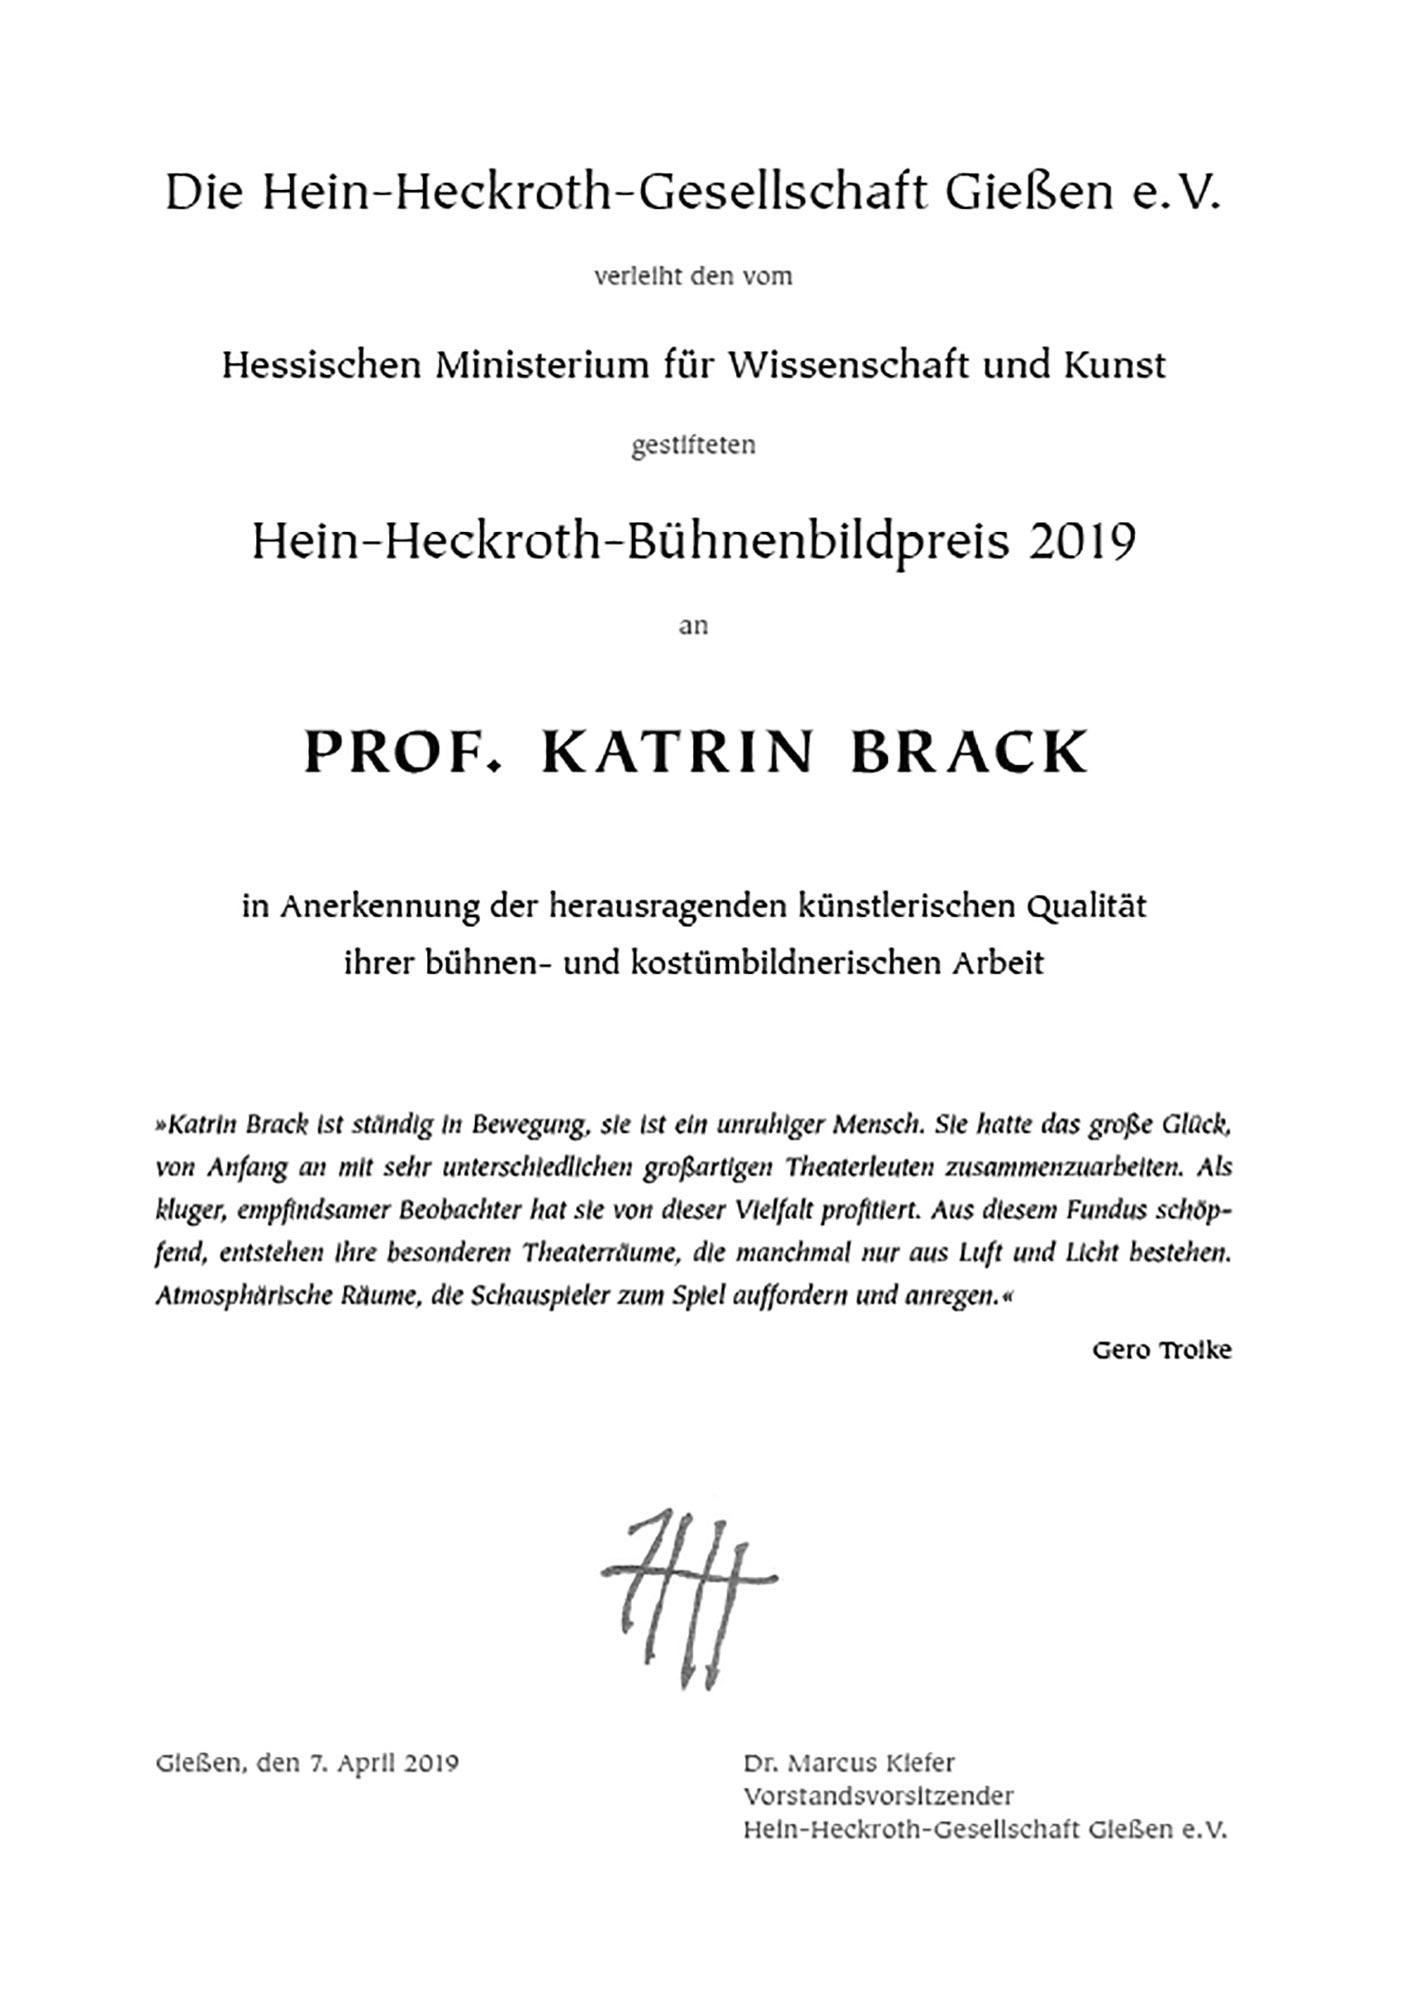 11-Urkunde-Brack-1.jpg